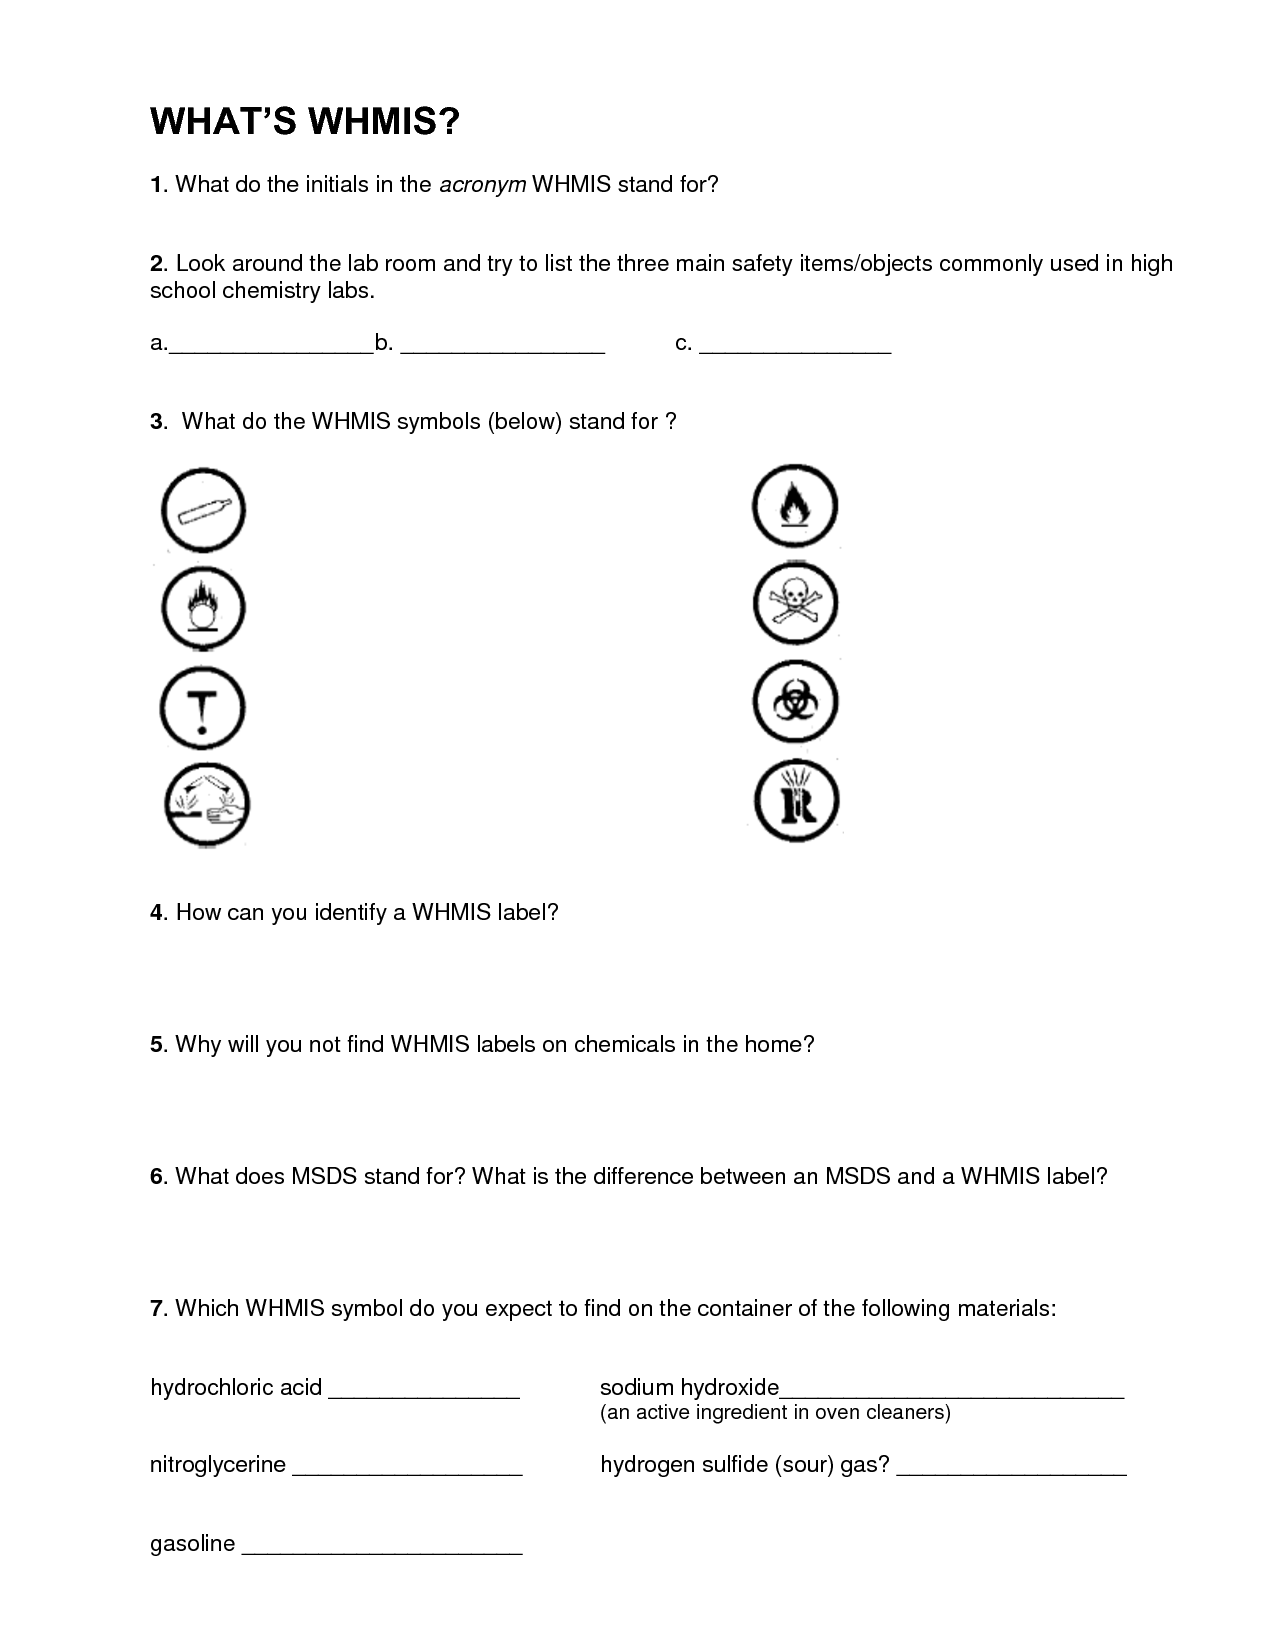 13 Best Images Of Safety Symbols Worksheet Answers